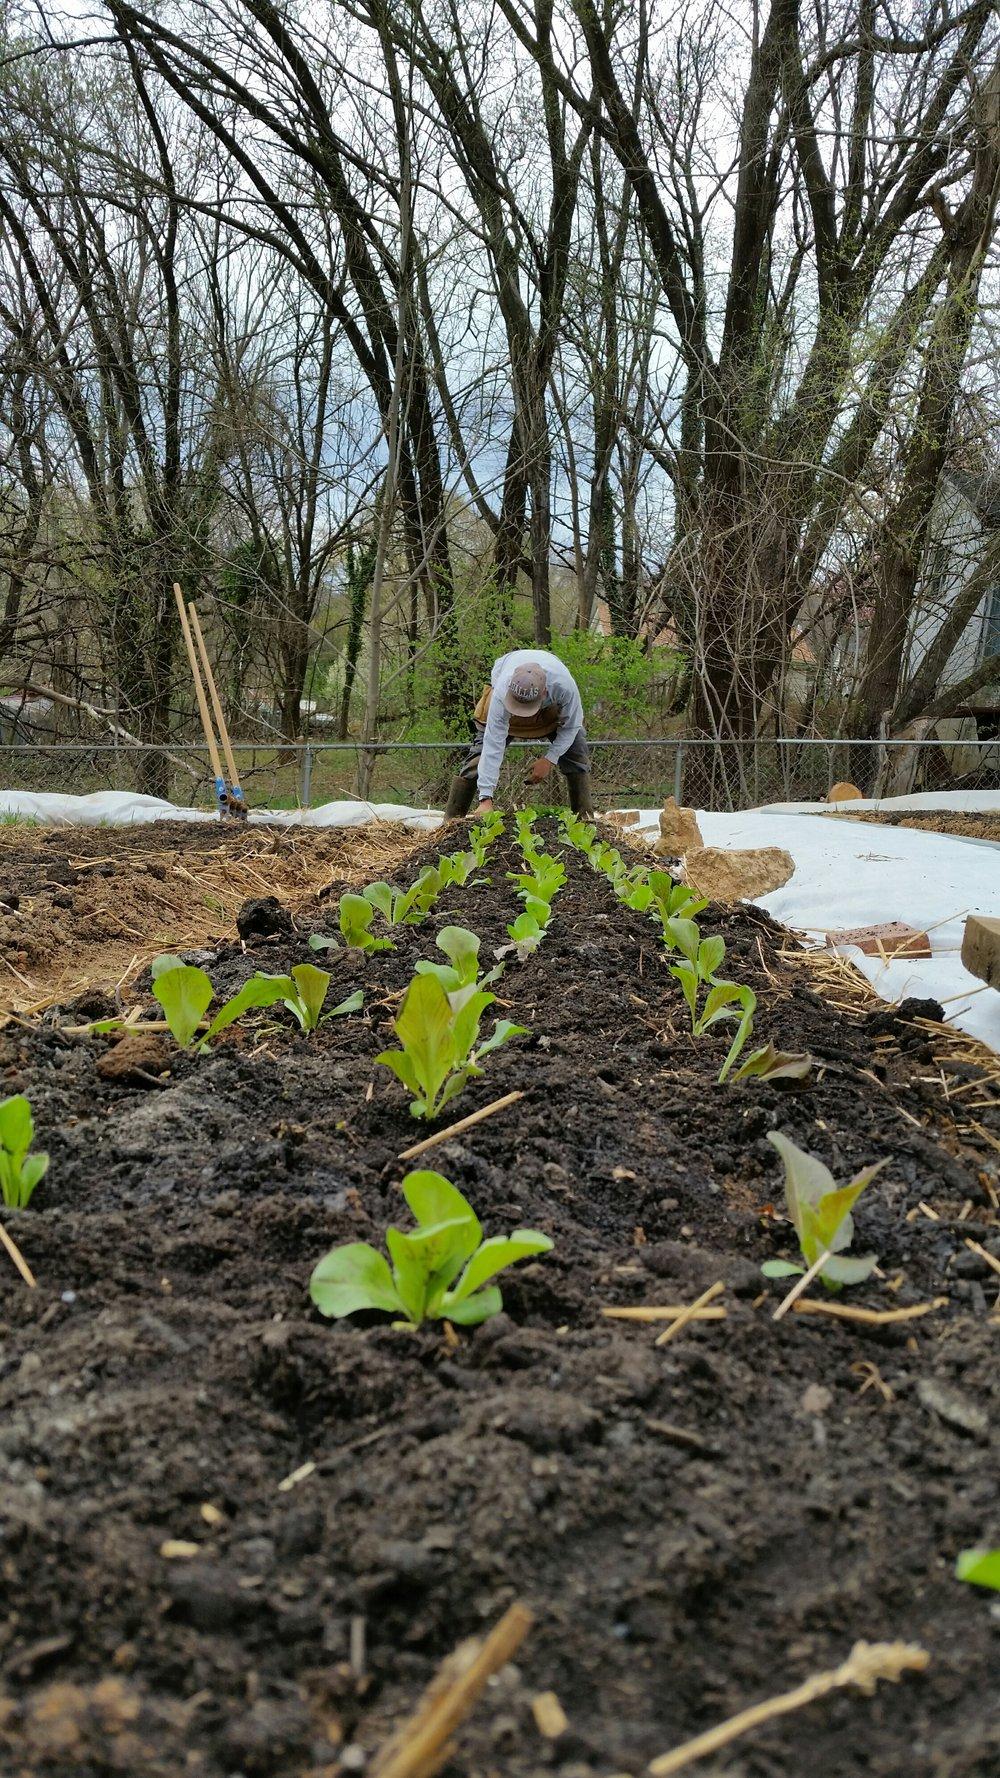 planting lettuce plugs